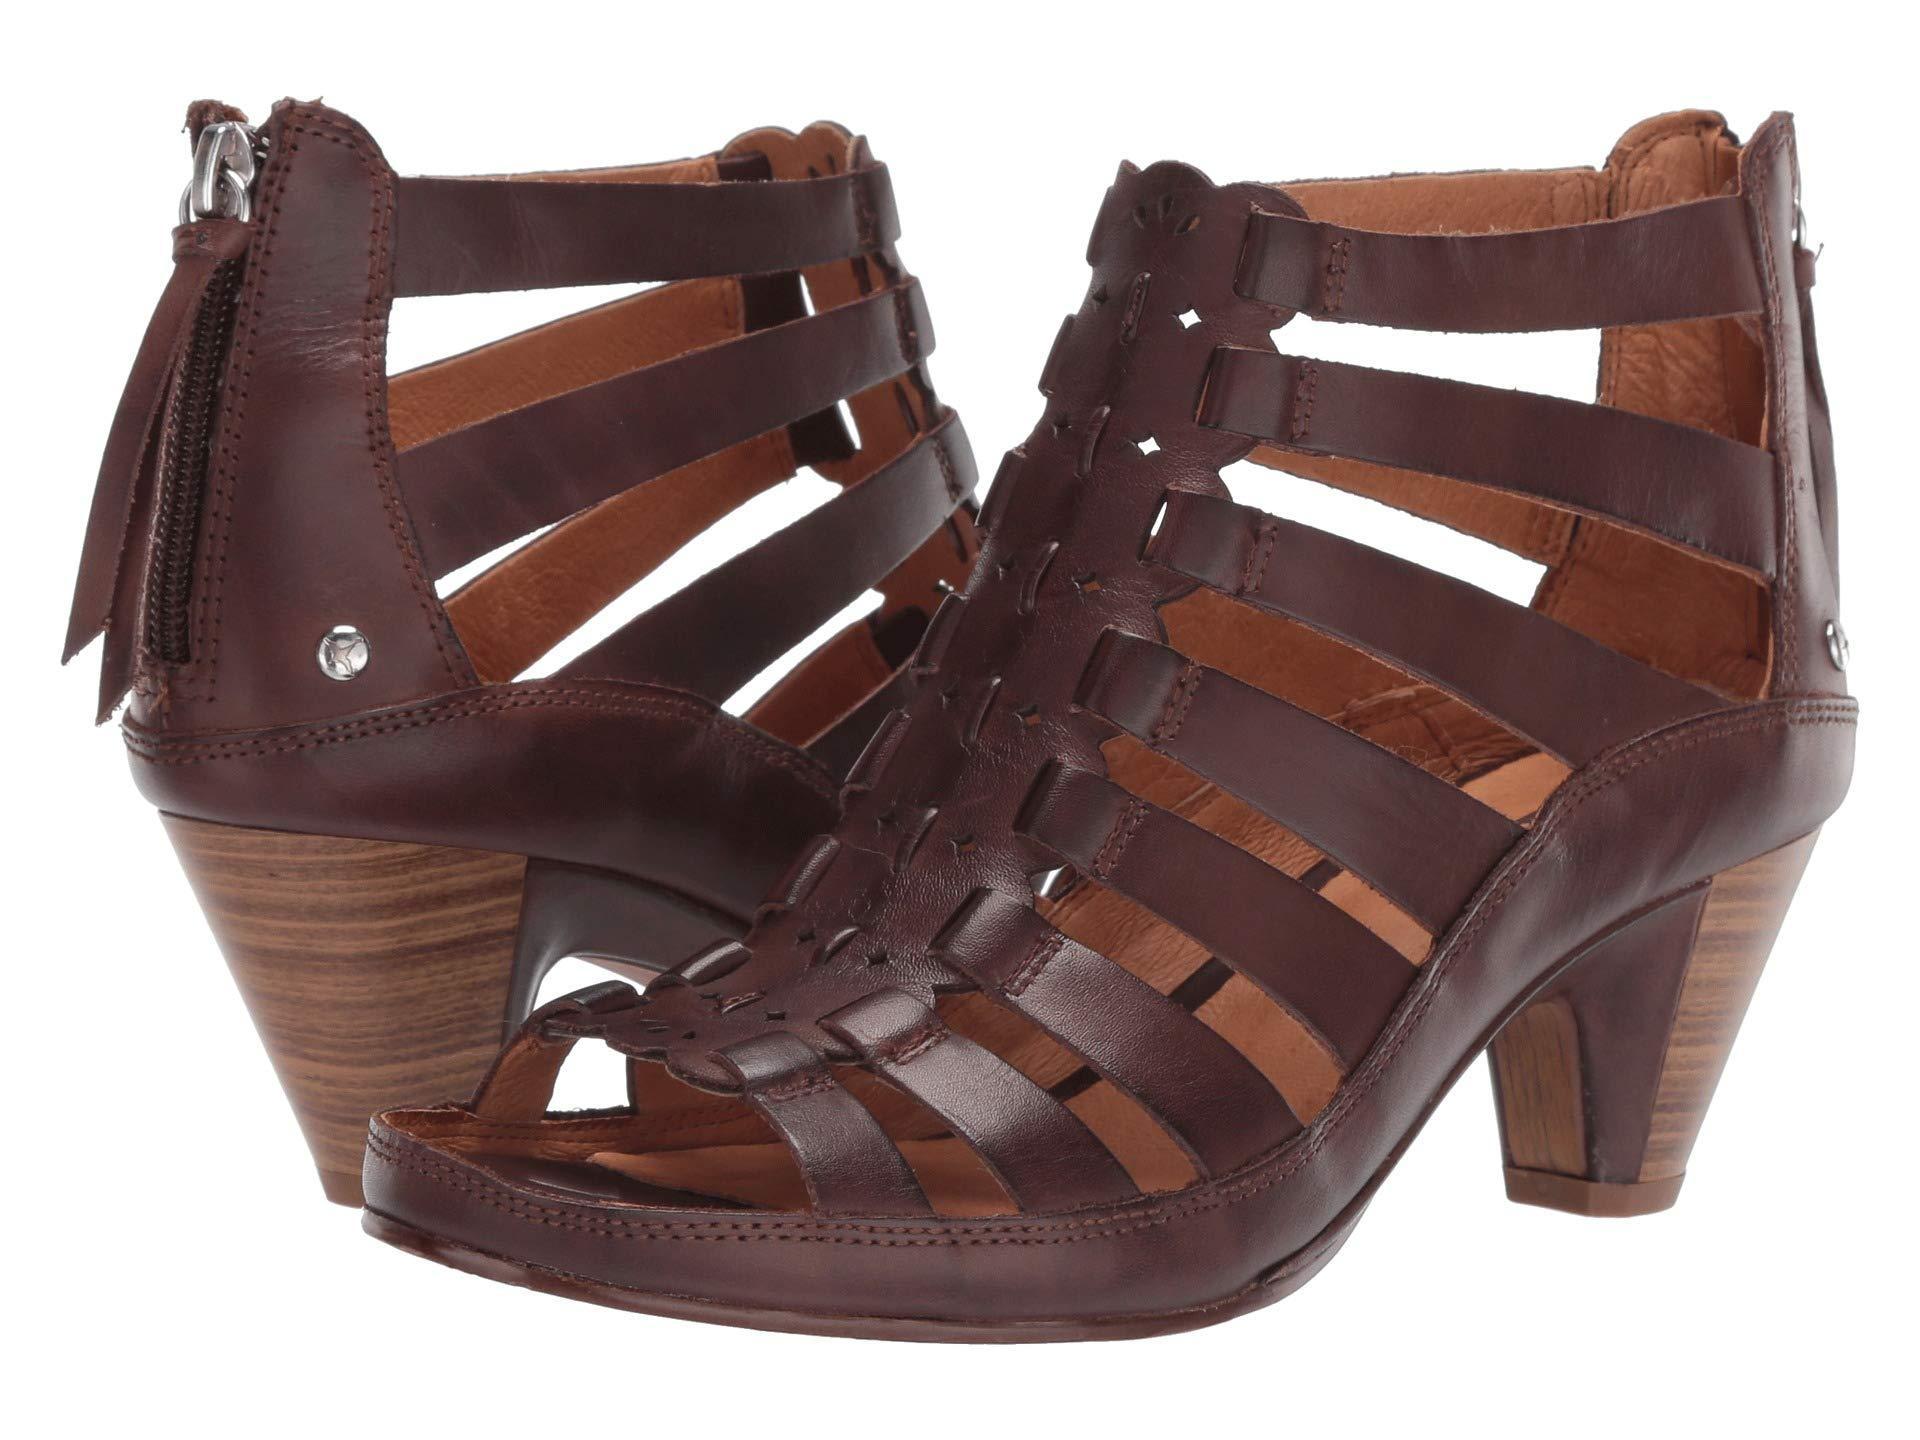 b9cb6ca0c7b Lyst - Pikolinos Java W5a-1701 (brandy) Women s Shoes in Brown